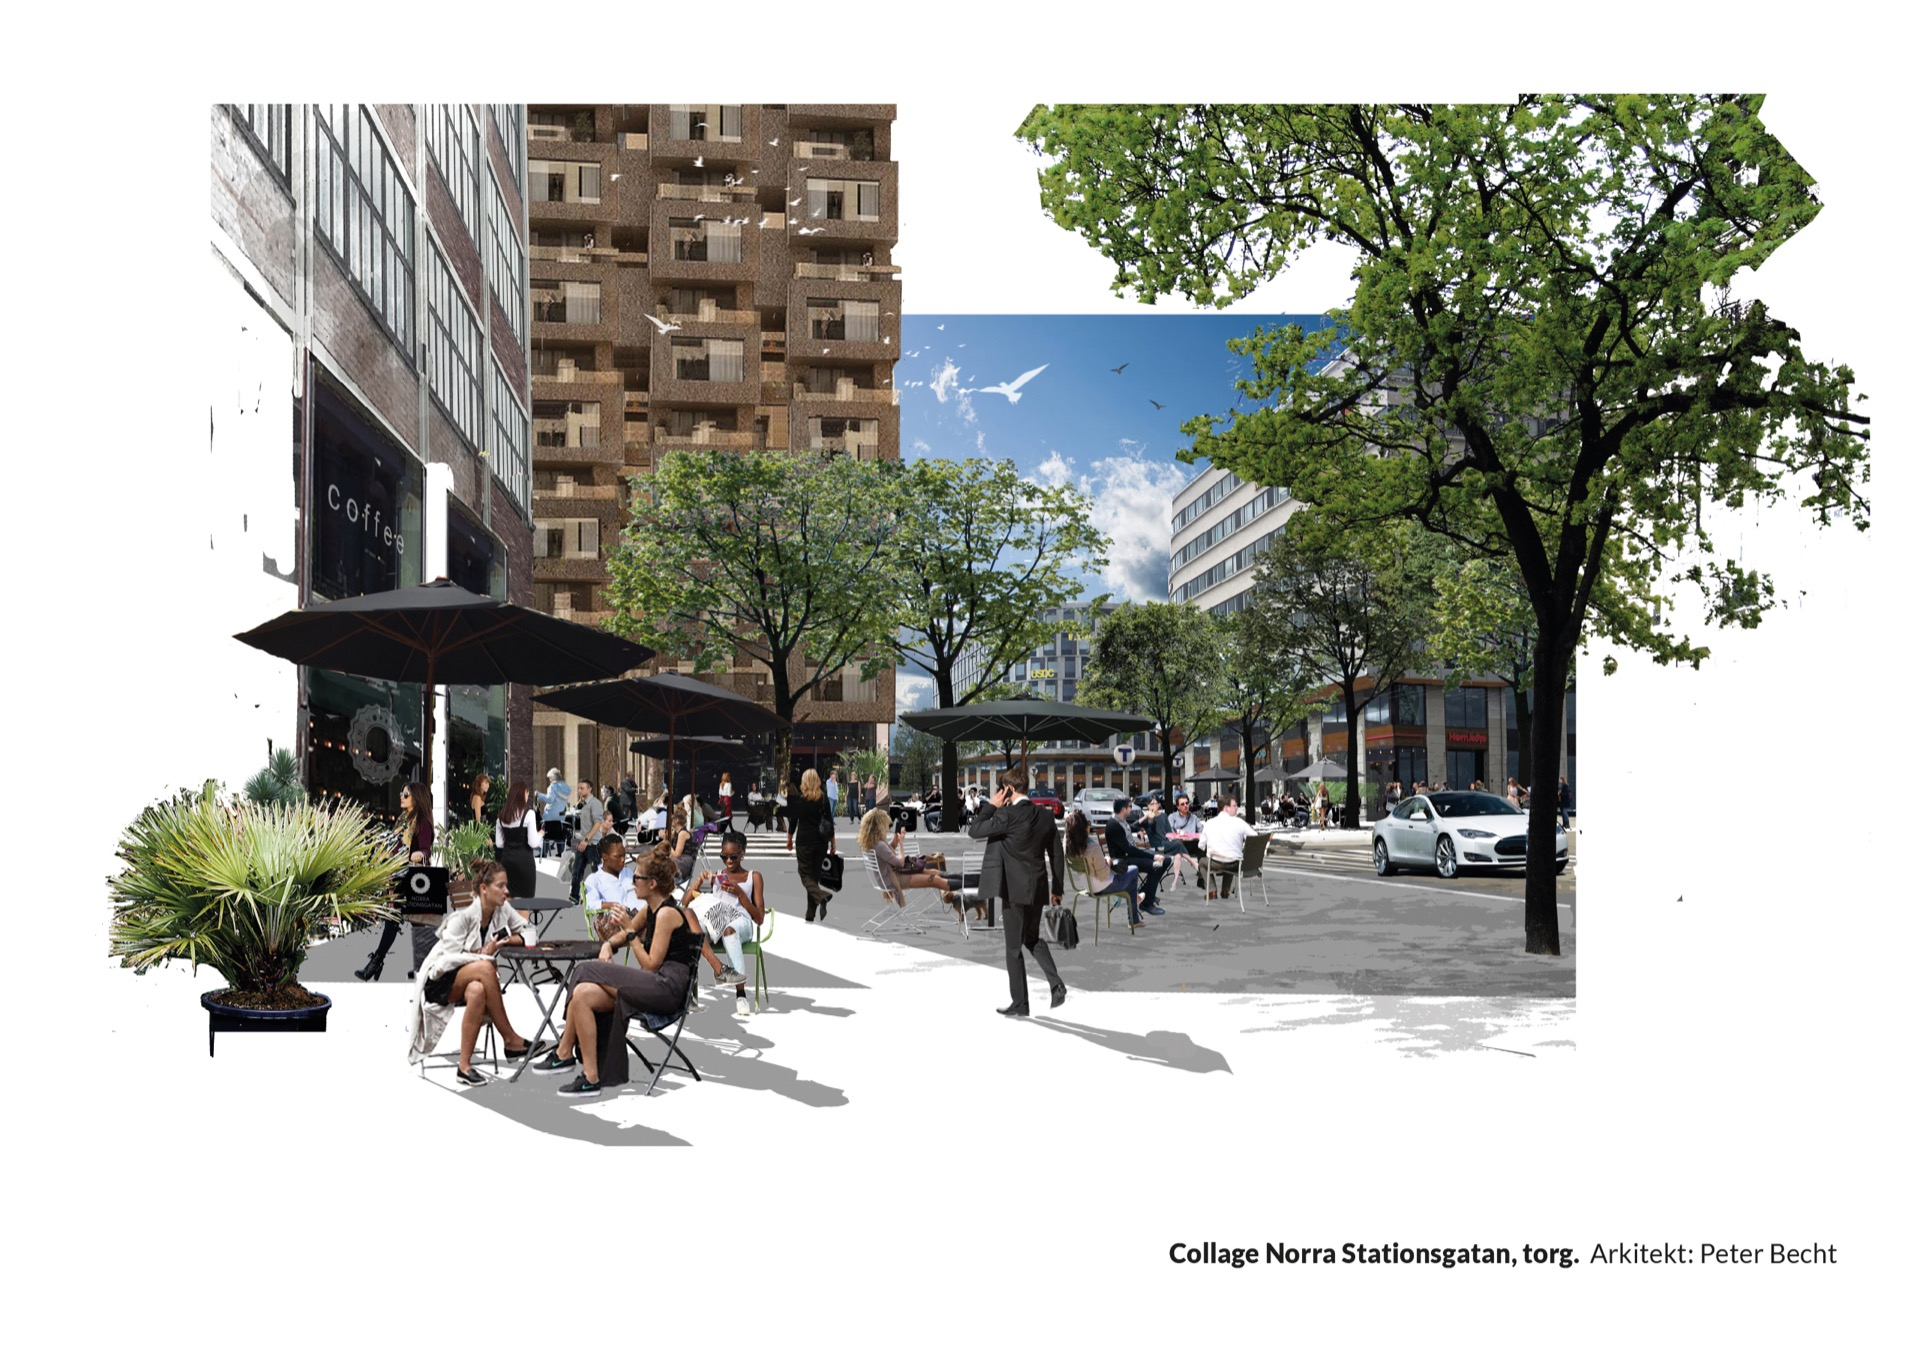 Collage Norra Stationsgatan, torg. Arkitekt: Peter Becht